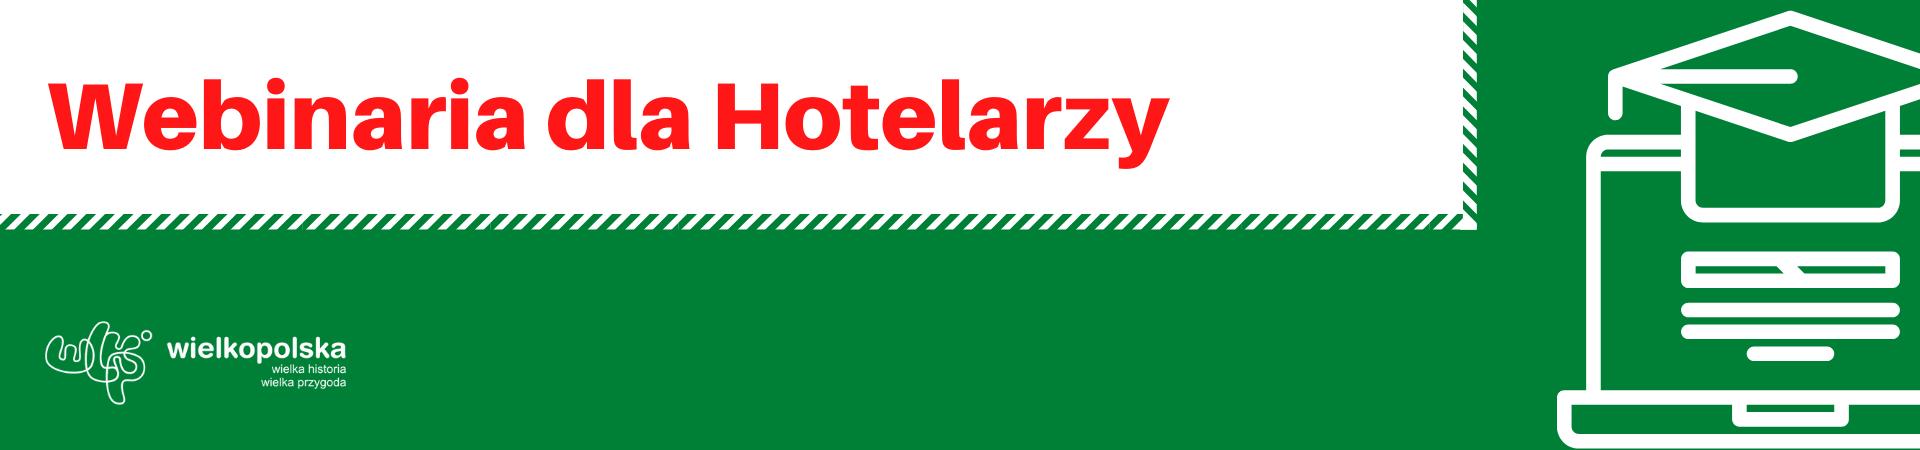 Webinaria dla hotelarzy